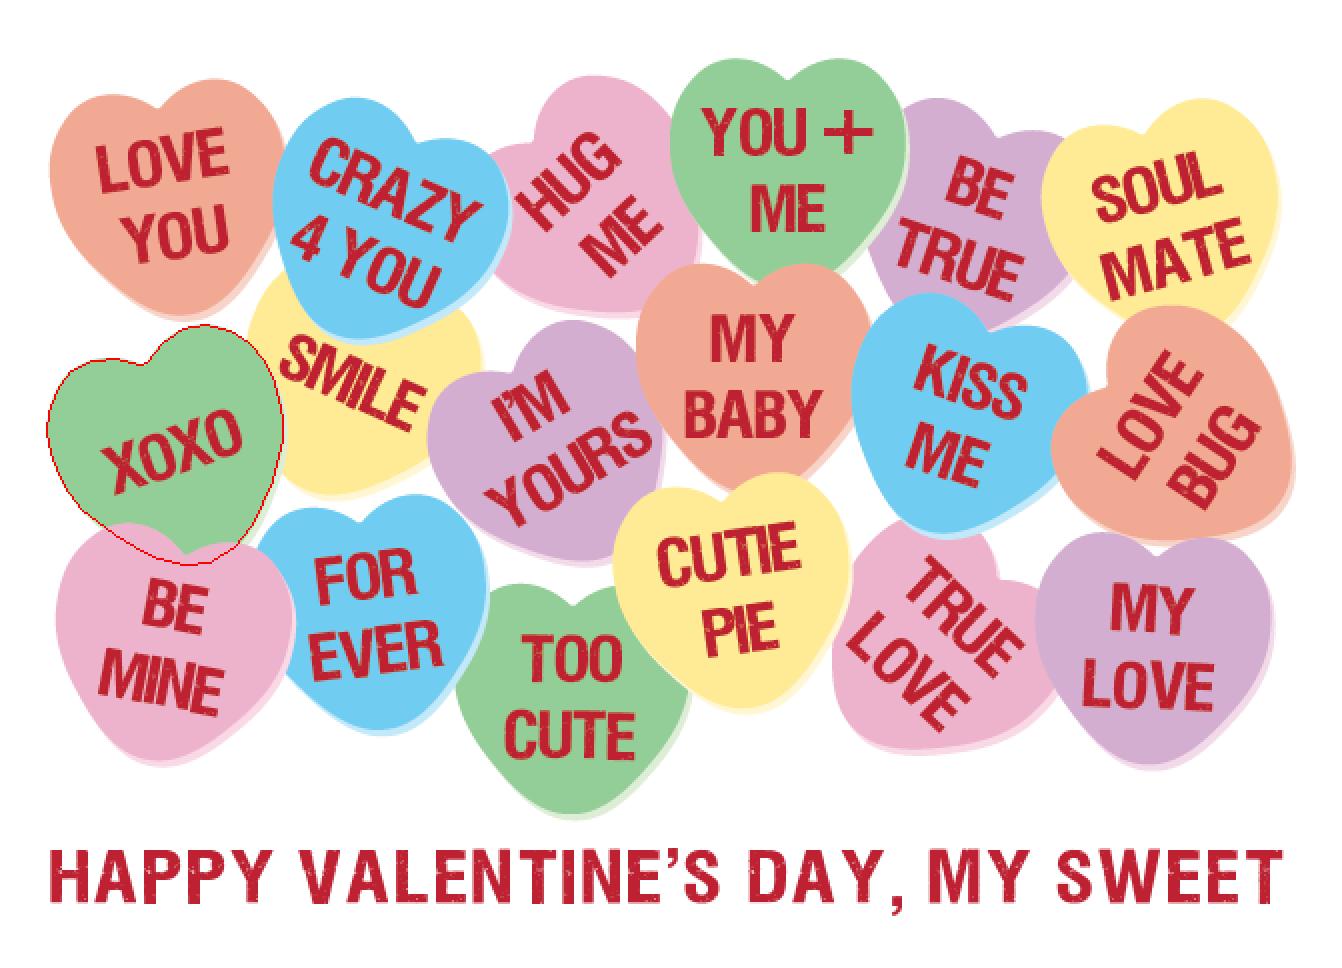 original artwork using words to describe valentines day sayings send - Send A Valentine